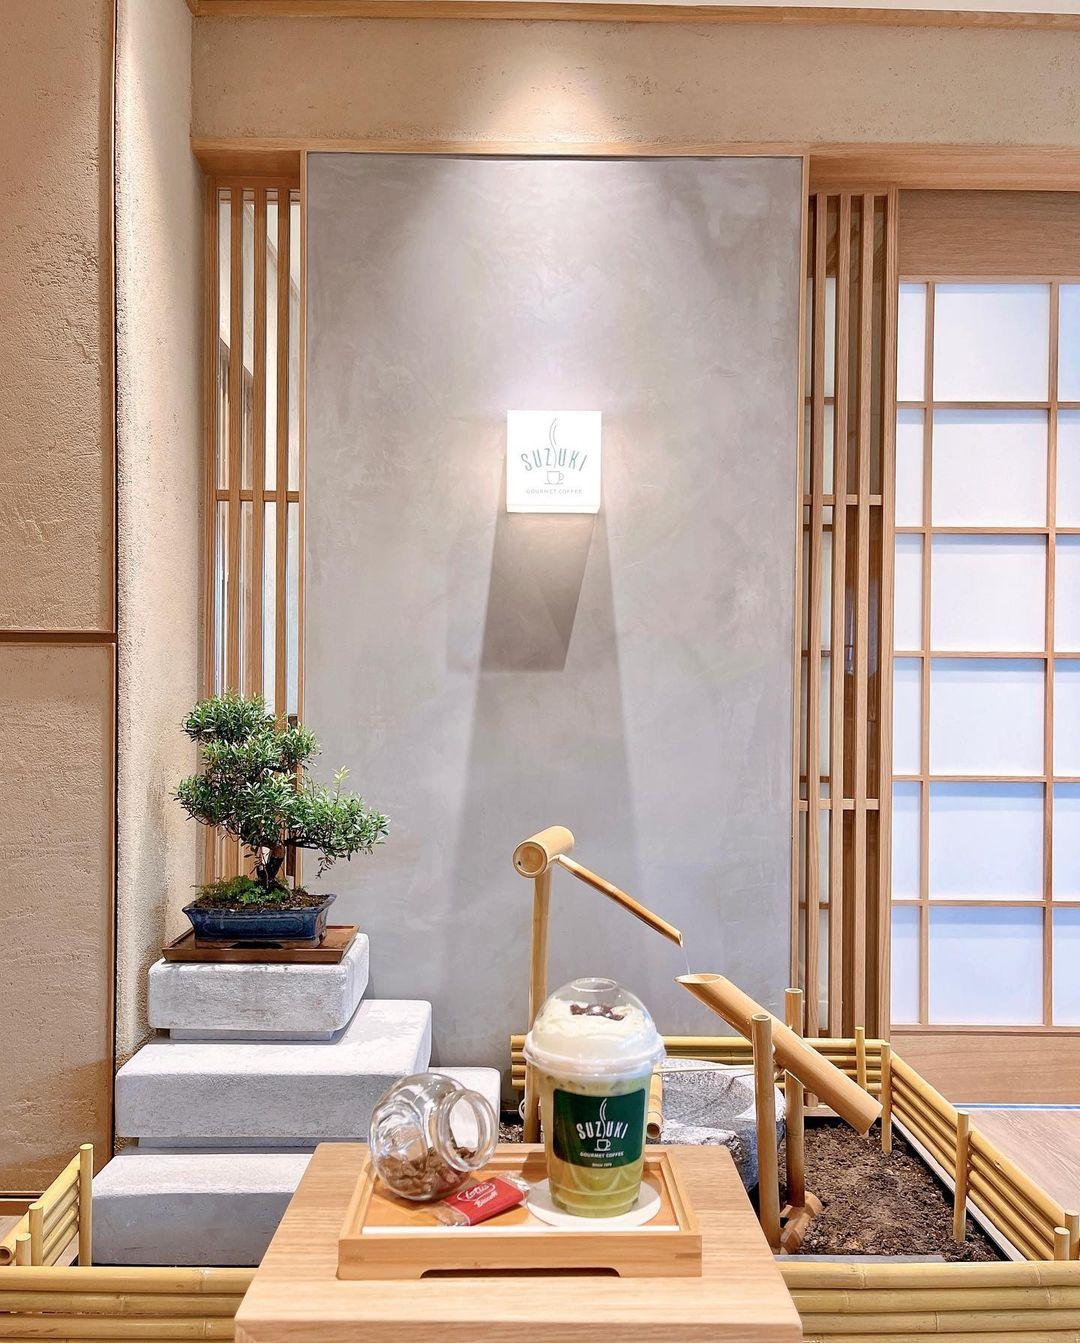 Suzuki Factory Cafe - interior decor